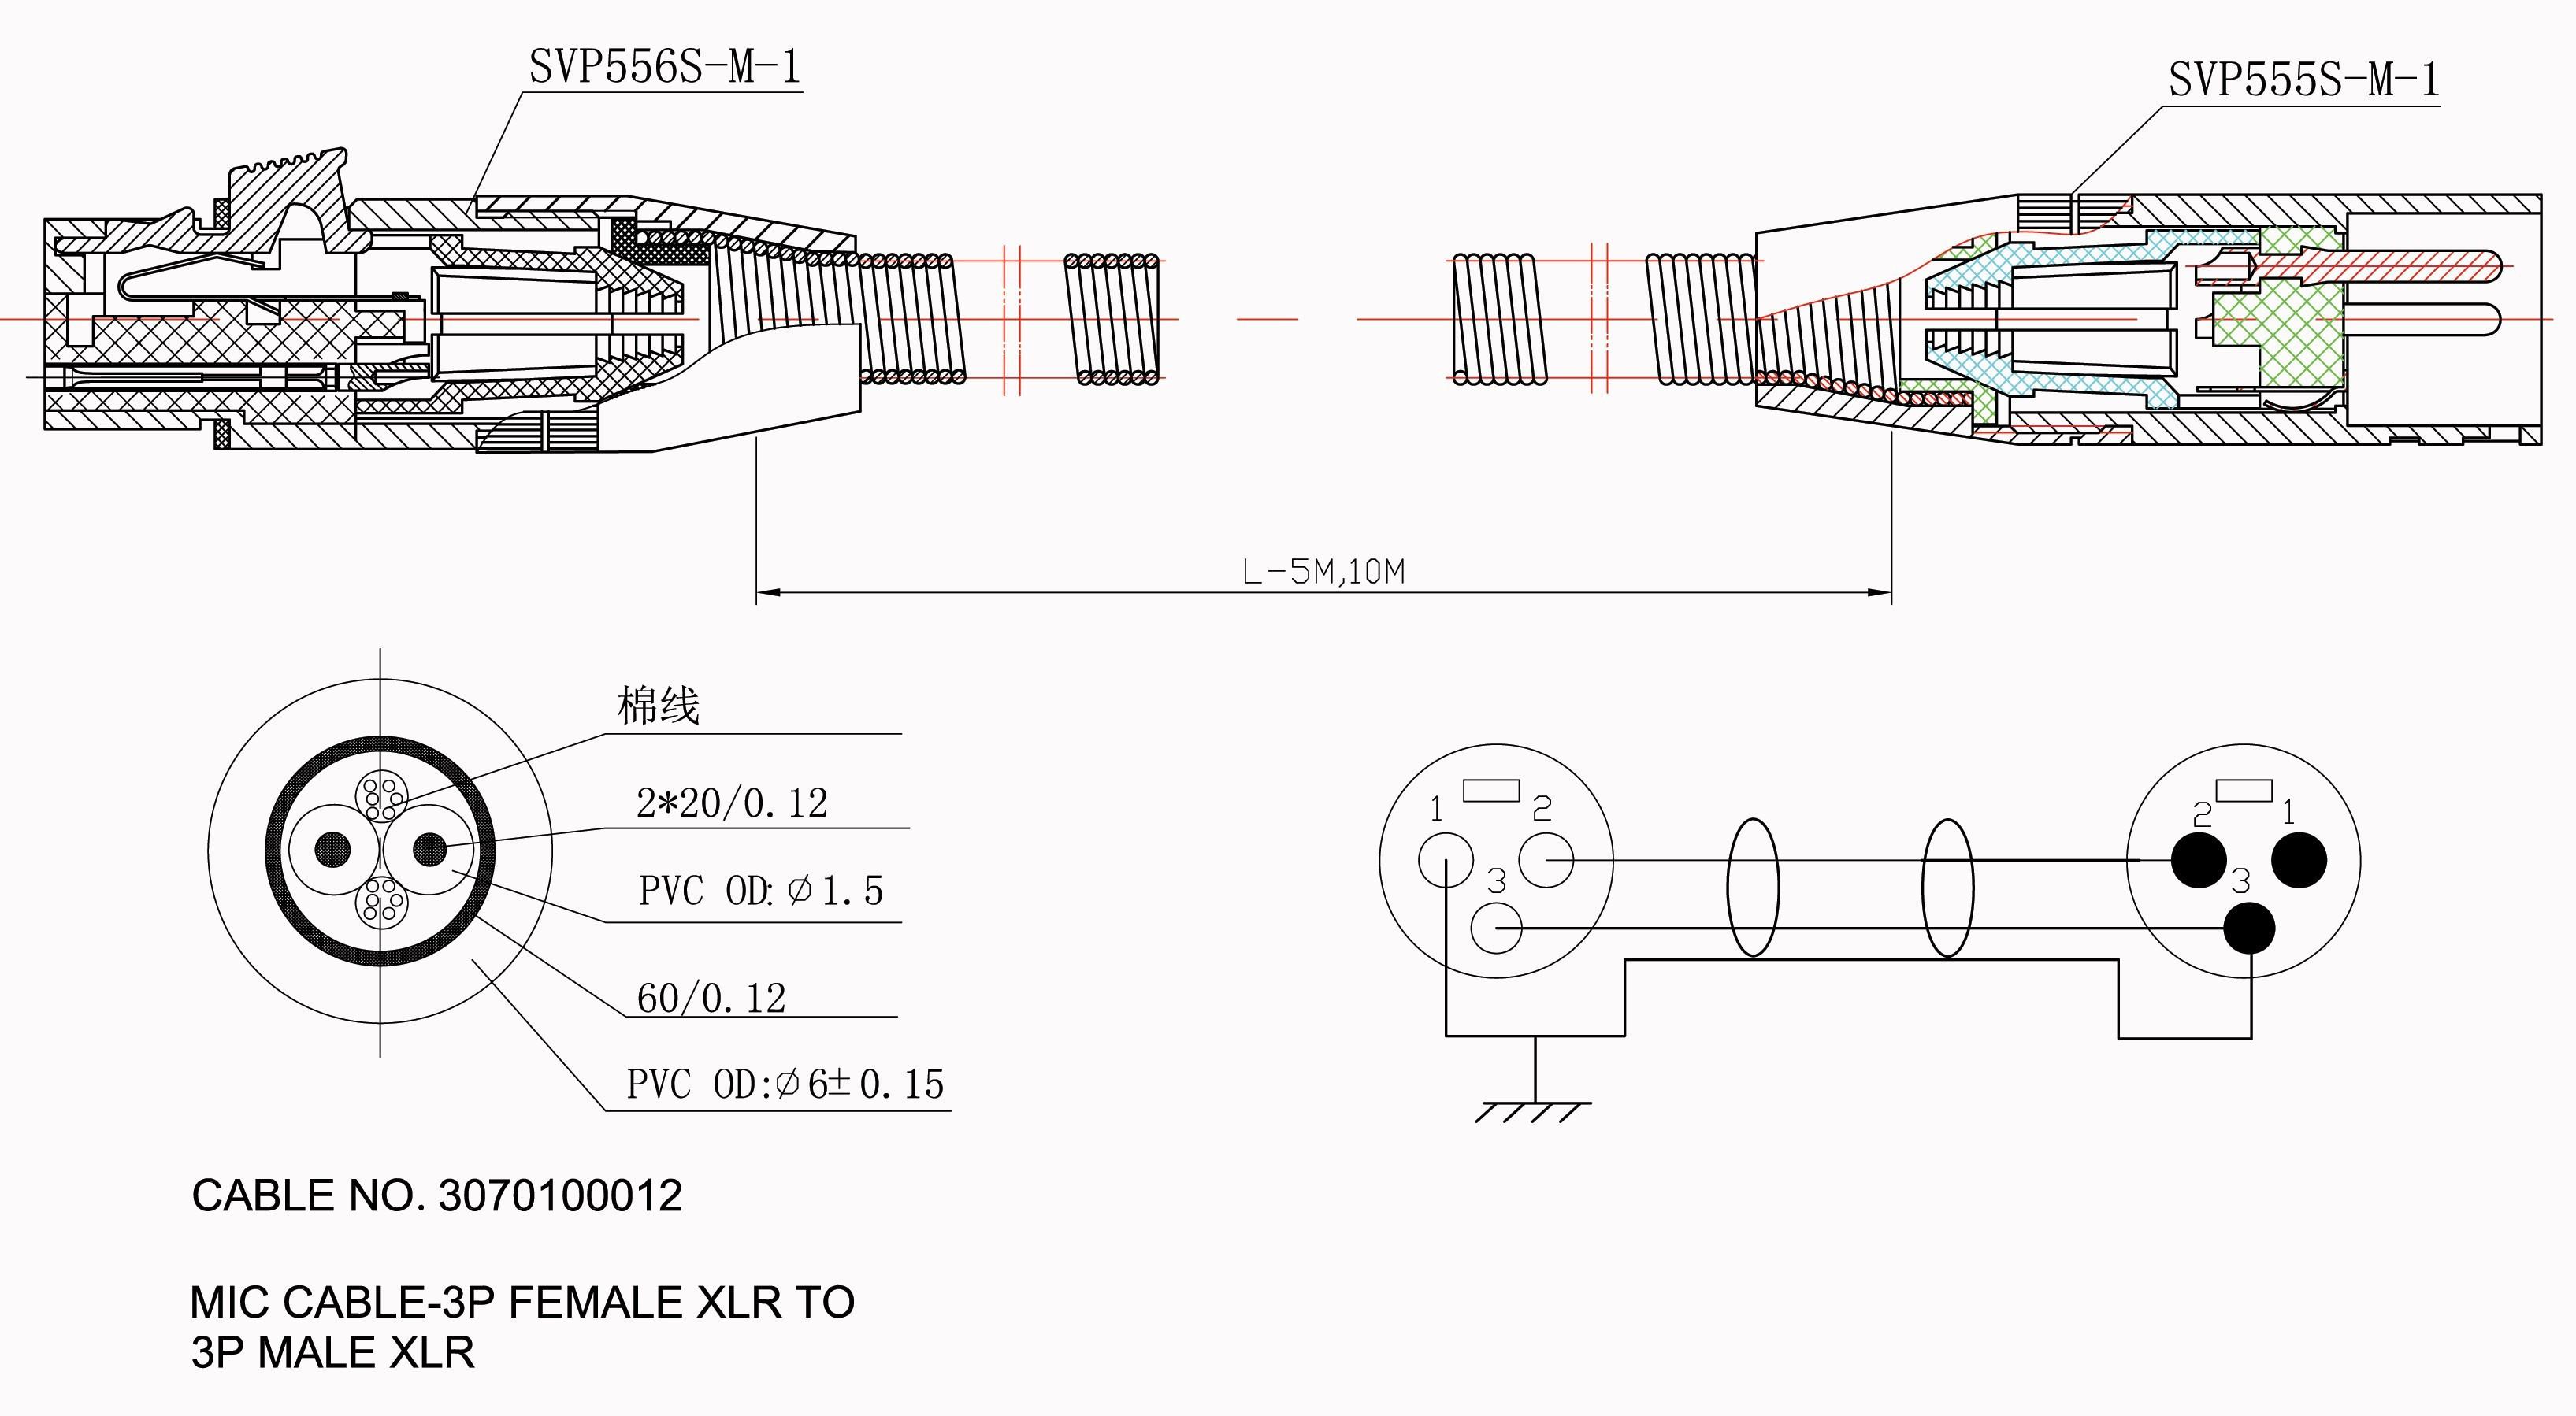 2000 Nissan Pathfinder Engine Diagram Nissan Pathfinder Electrical Wiring Diagram Manualgo to Download Of 2000 Nissan Pathfinder Engine Diagram